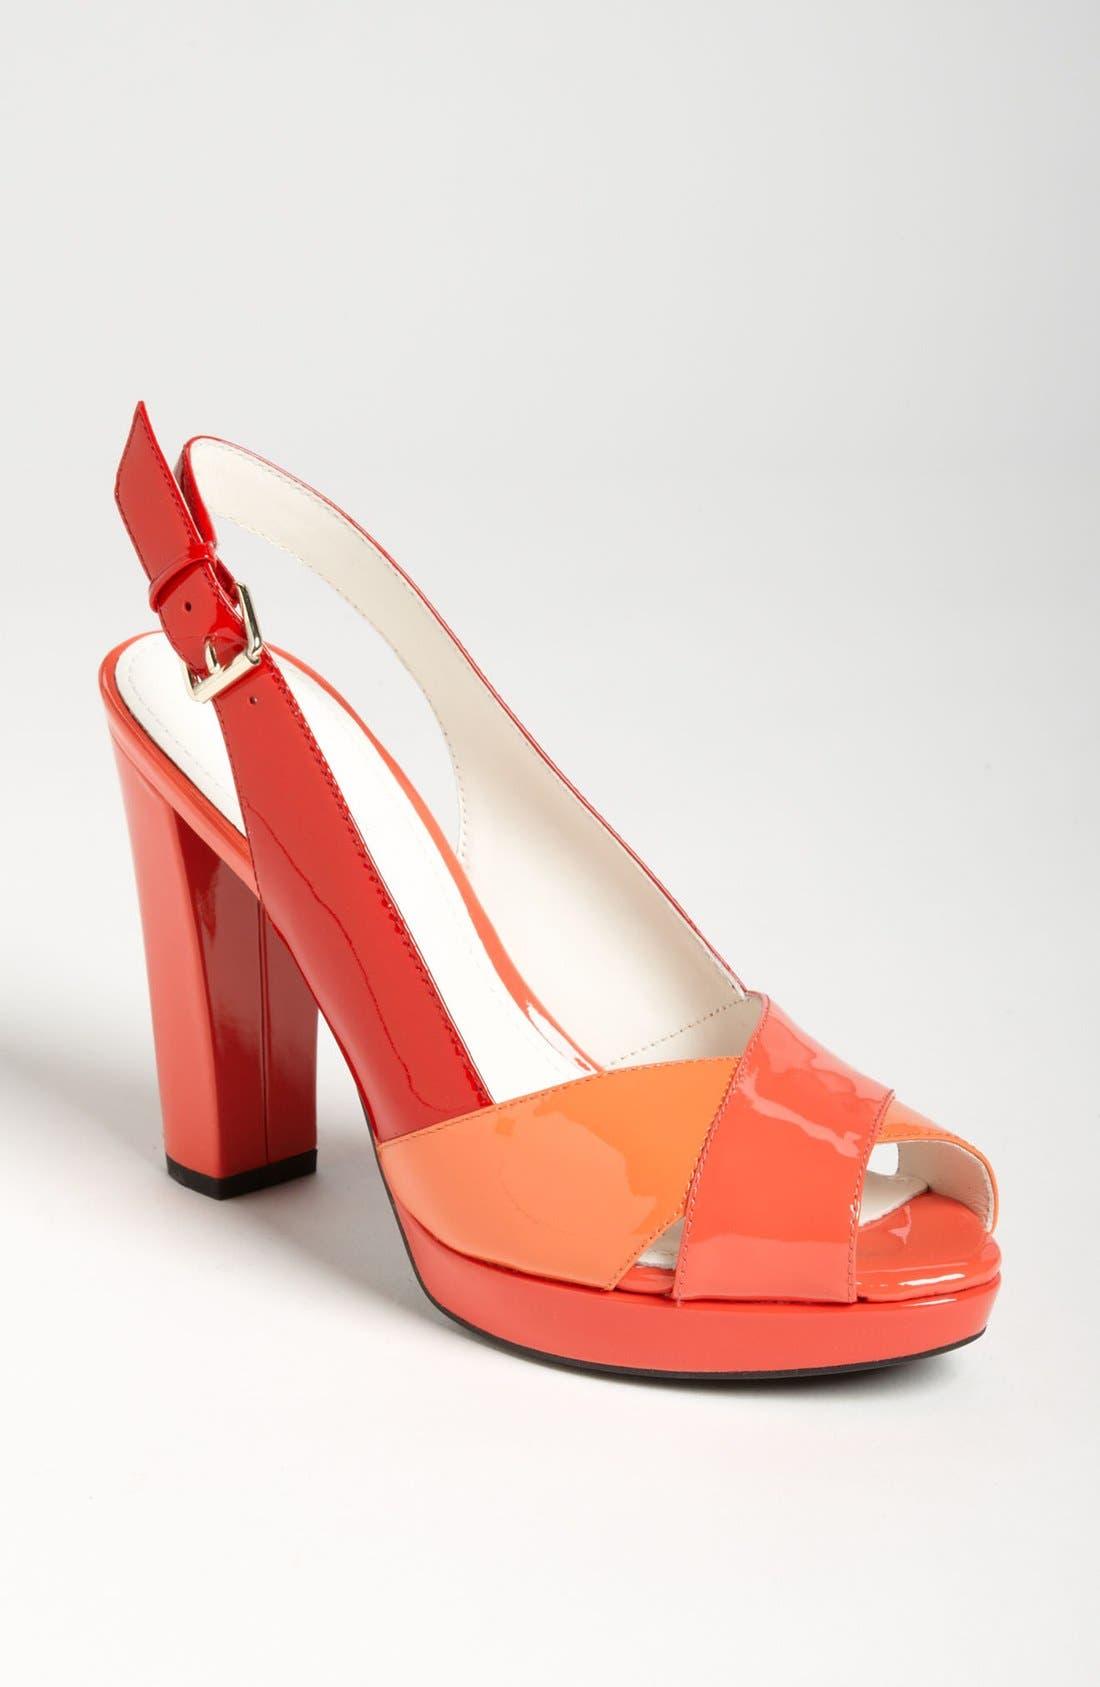 Alternate Image 1 Selected - Geox 'New Egizia' Slingback Sandal